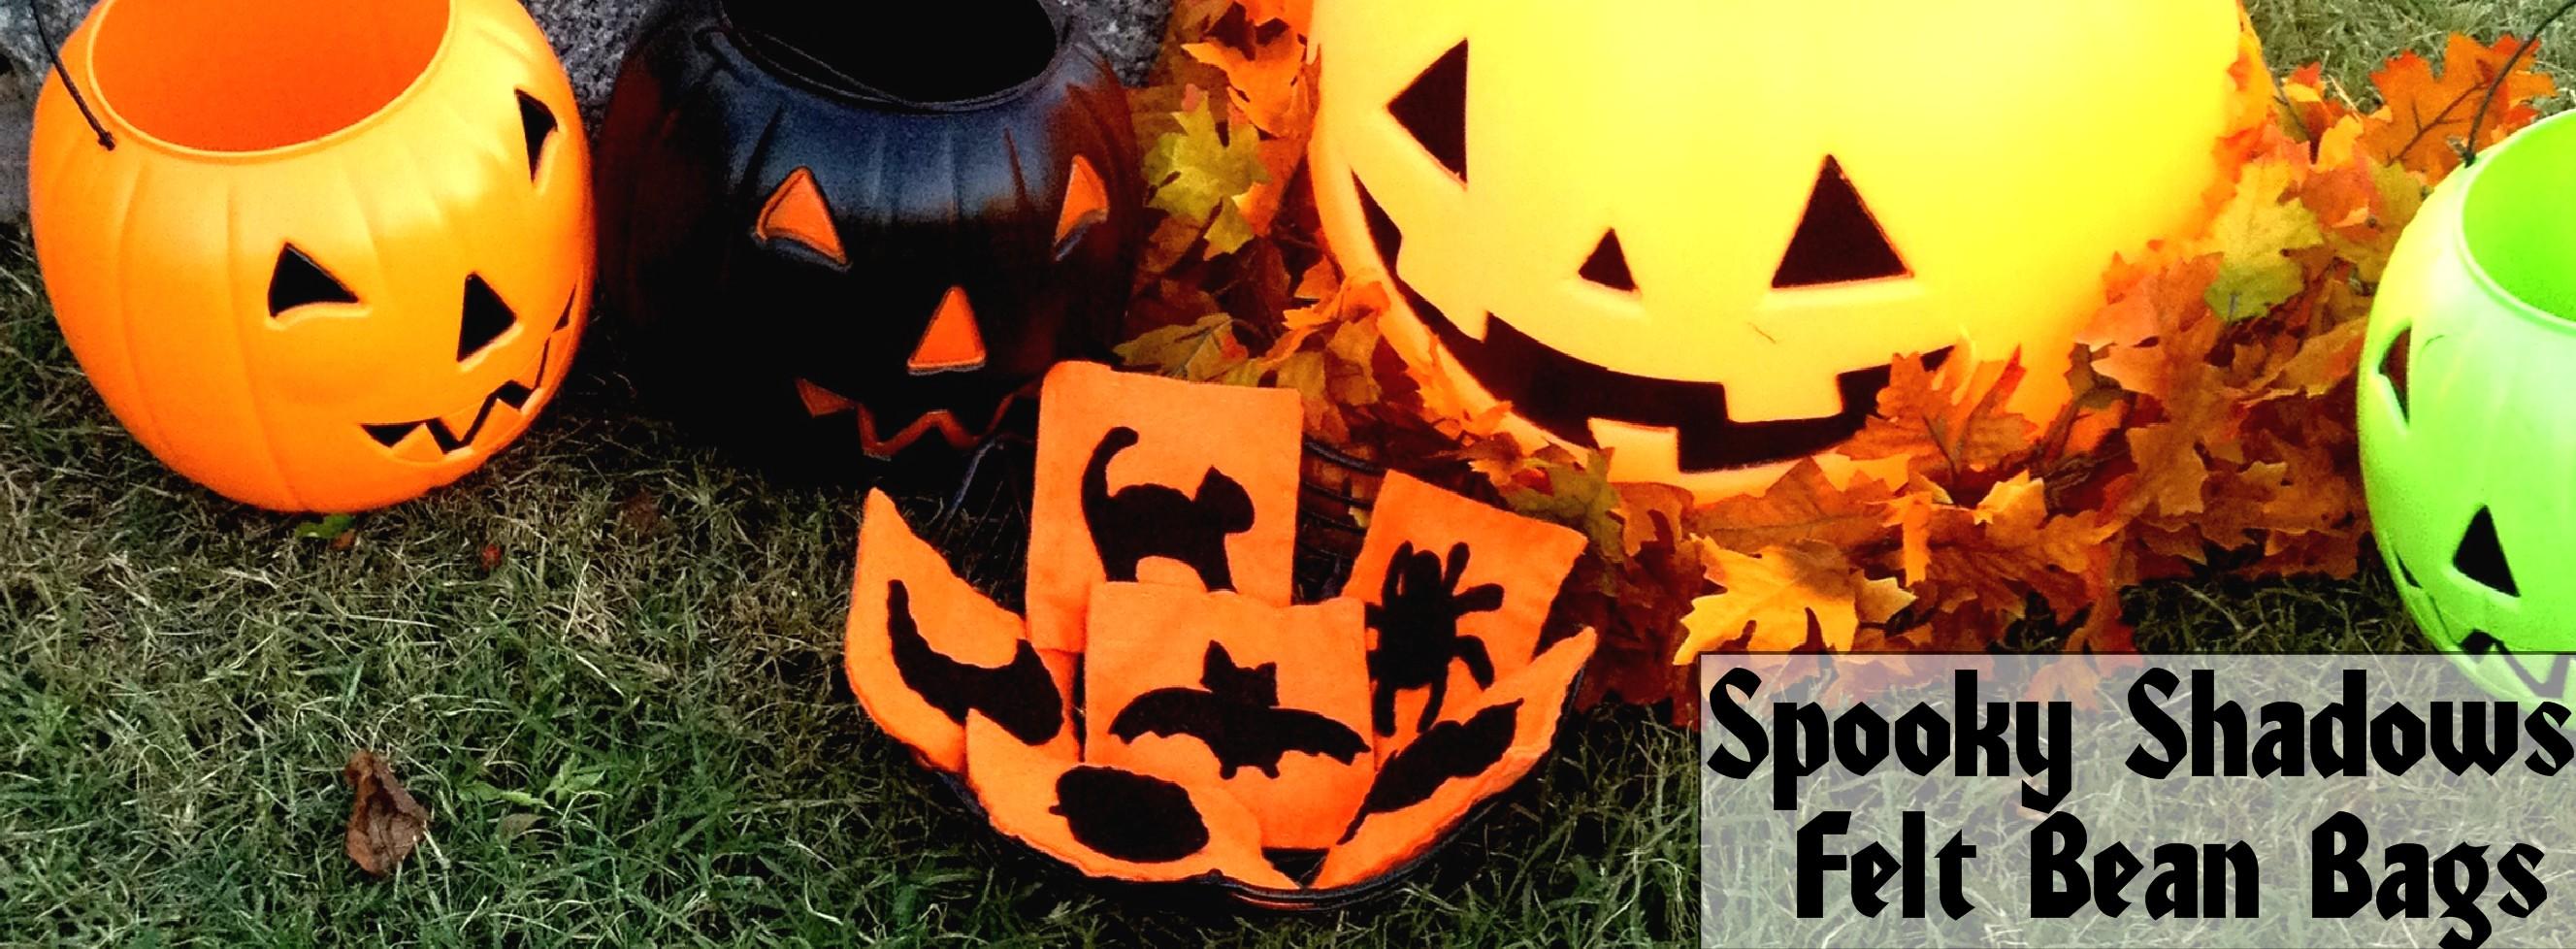 Wondrous Spooky Shadows Diy Halloween Felt Bean Bag Tutorial Onthecornerstone Fun Painted Chair Ideas Images Onthecornerstoneorg